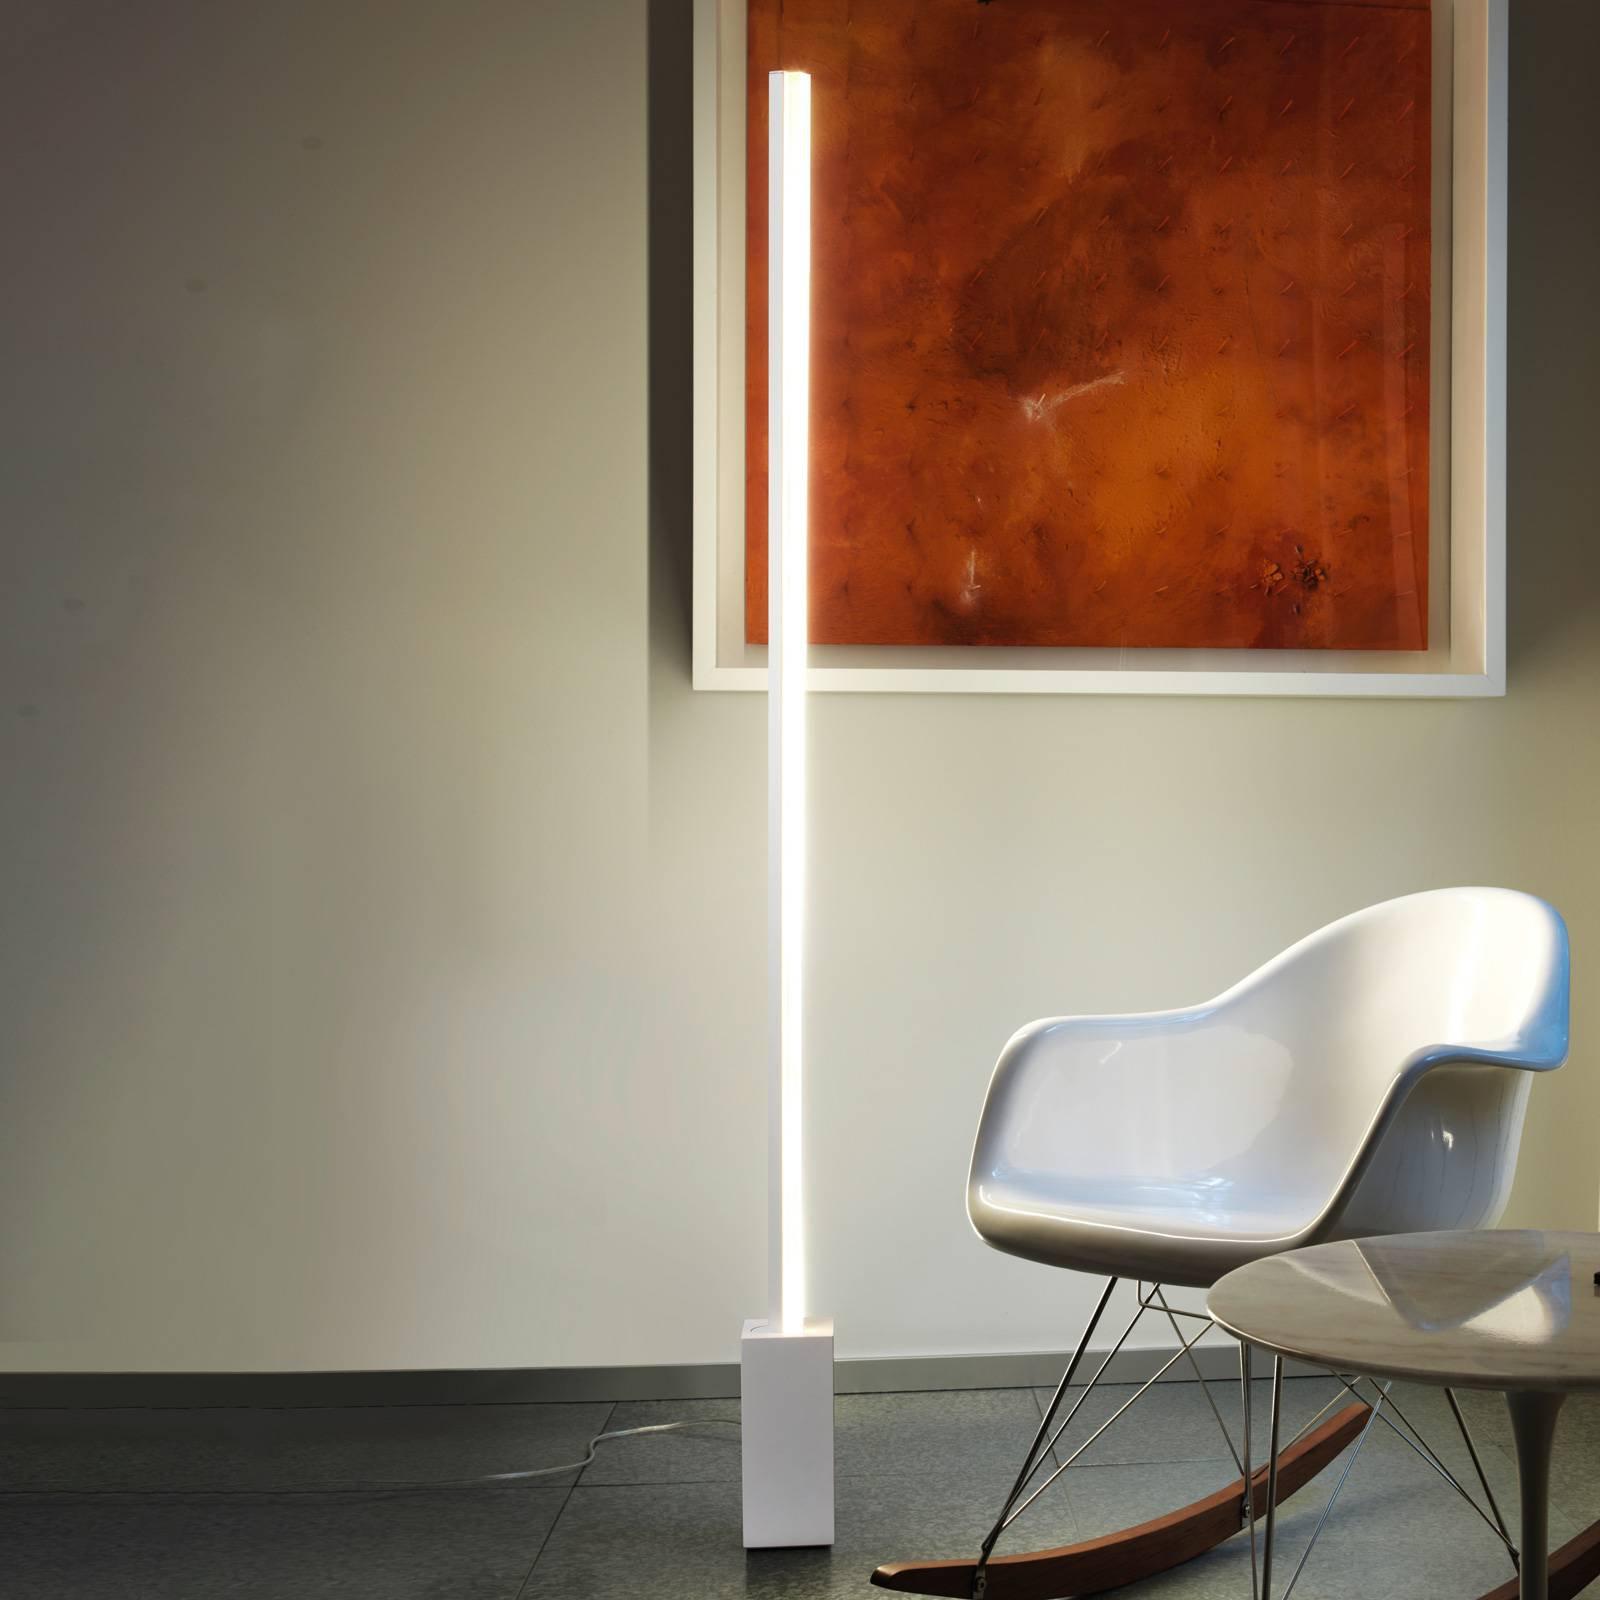 Grok Circ, LED-gulvlampe av aluminium med dimmer